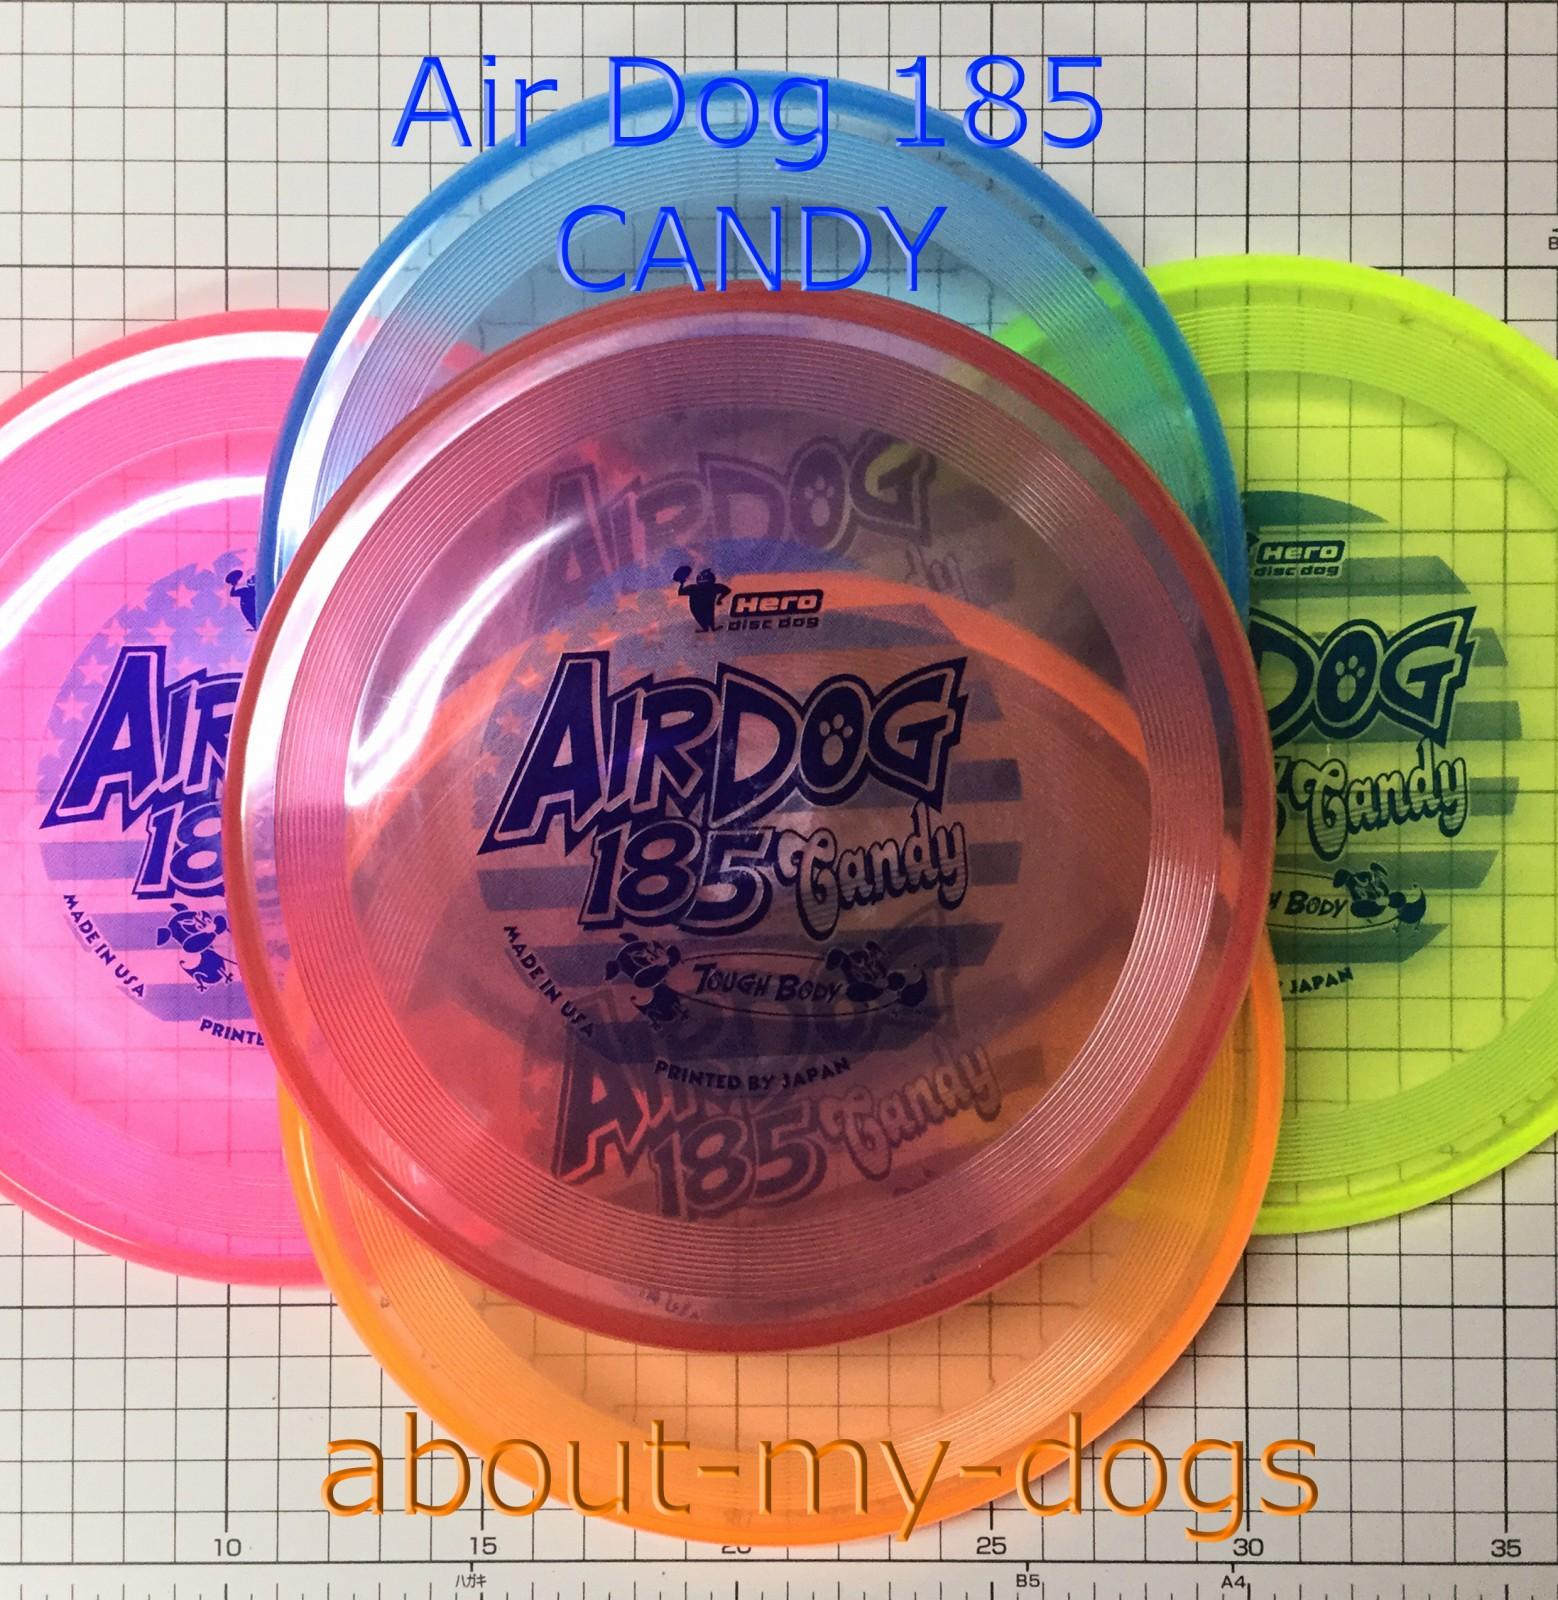 Airdog 185 CANDY new 丈夫なディスク